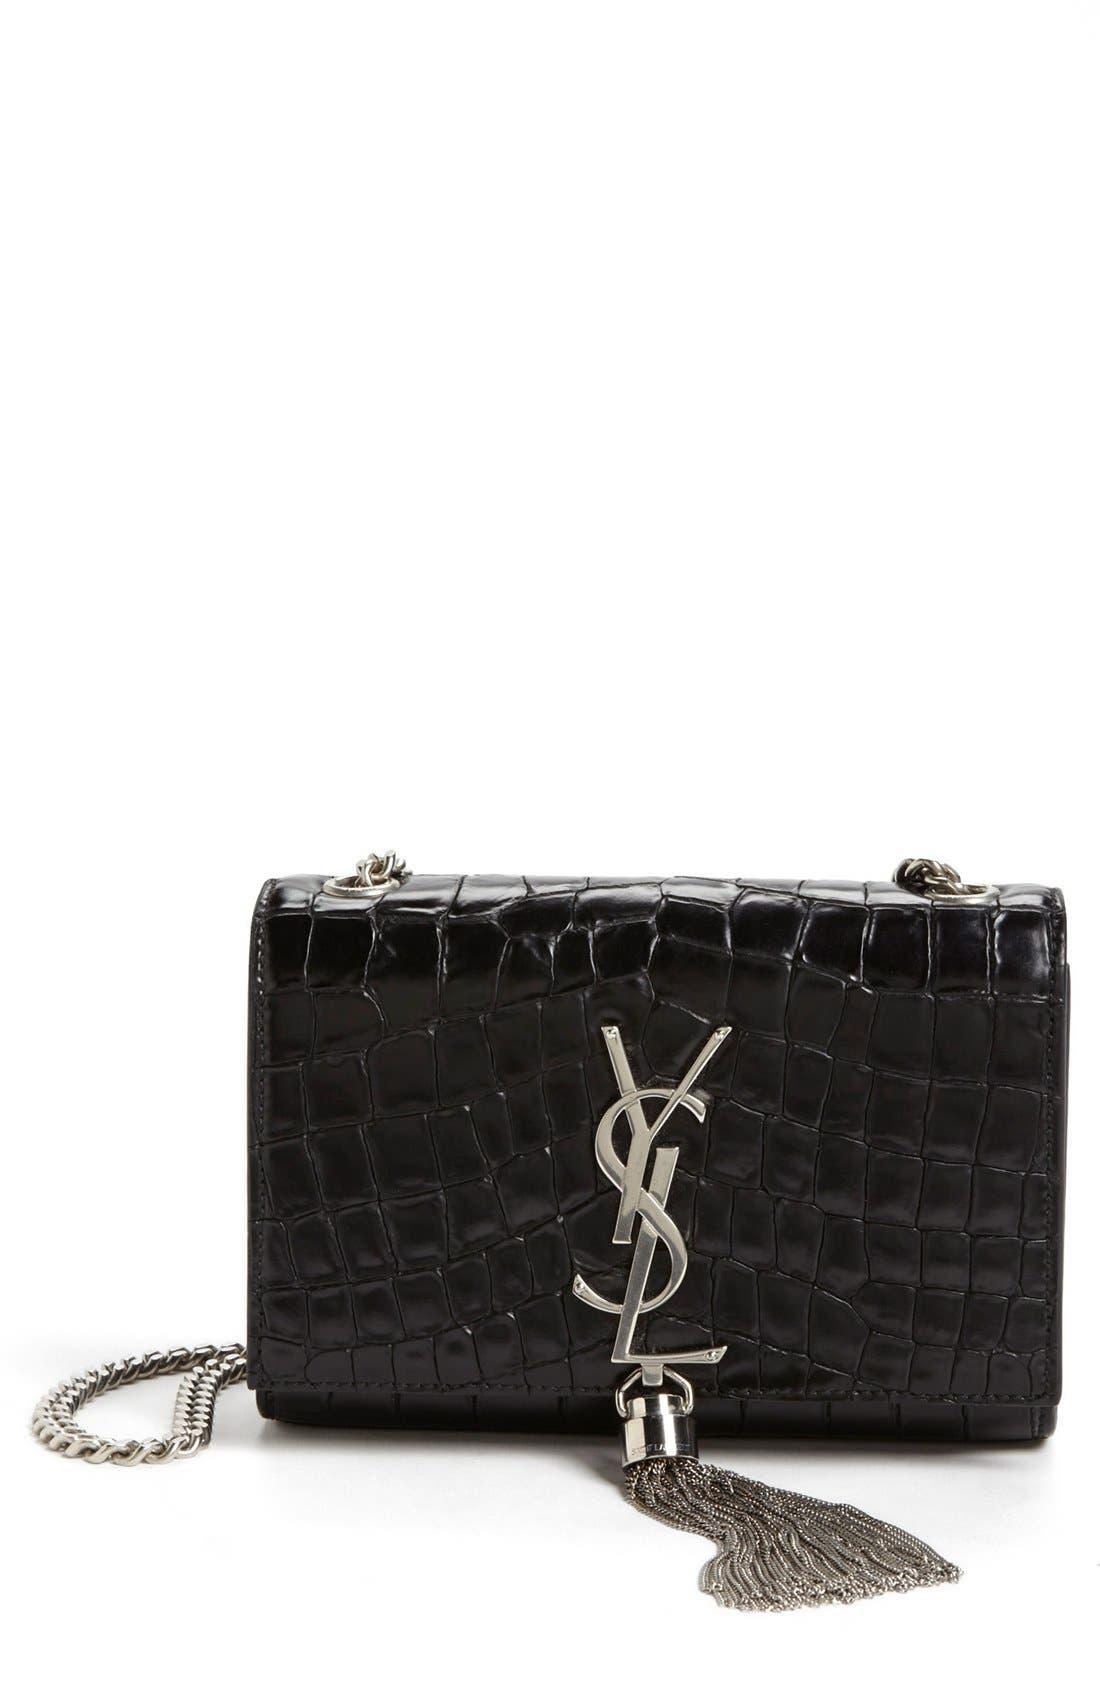 Alternate Image 1 Selected - Saint Laurent 'Cassandre' Shoulder Bag, Small